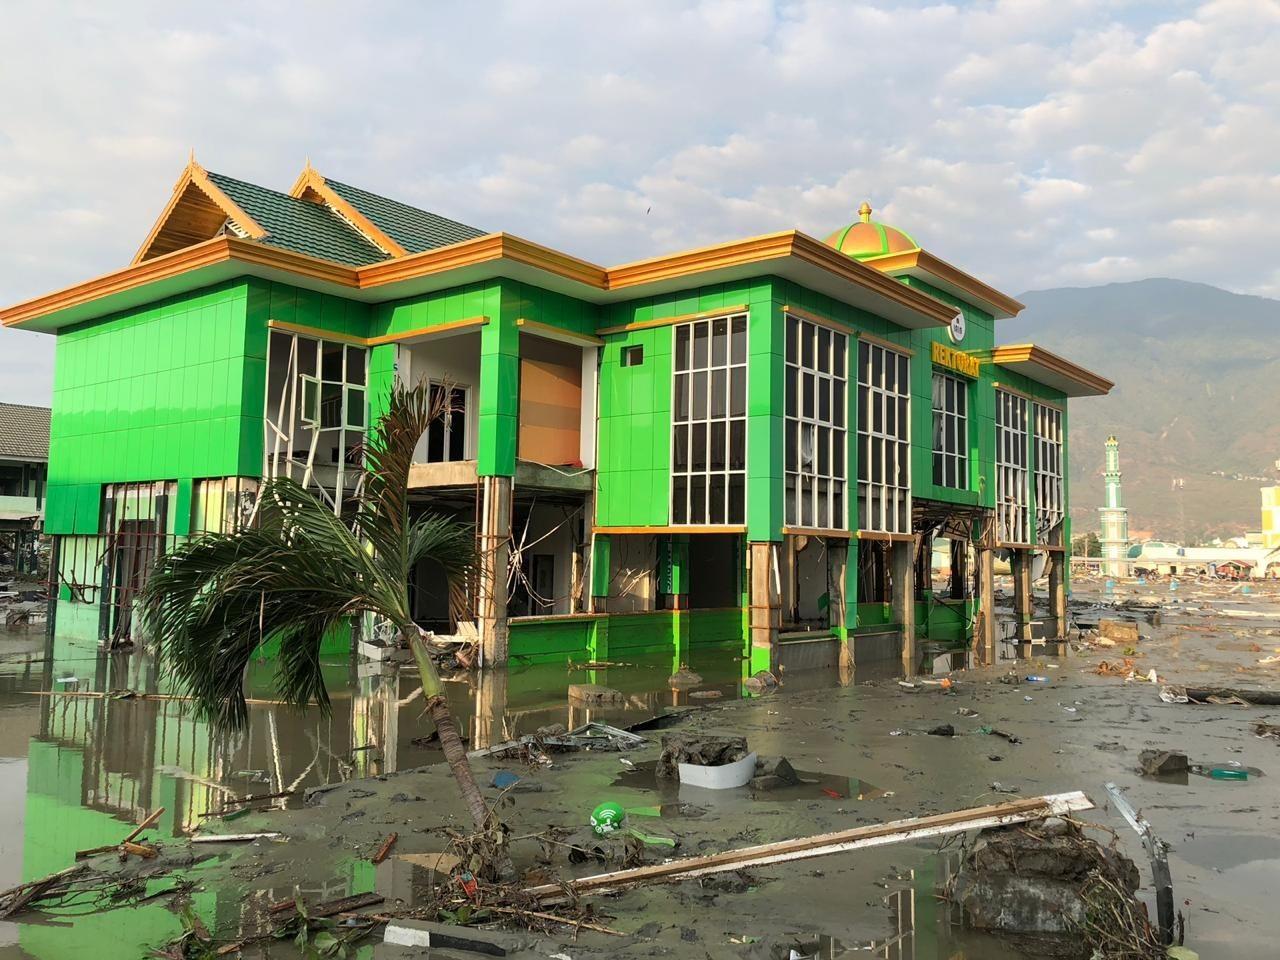 Tsunami, not collapsed buldings, killed most quake victims in Palu: BNPB